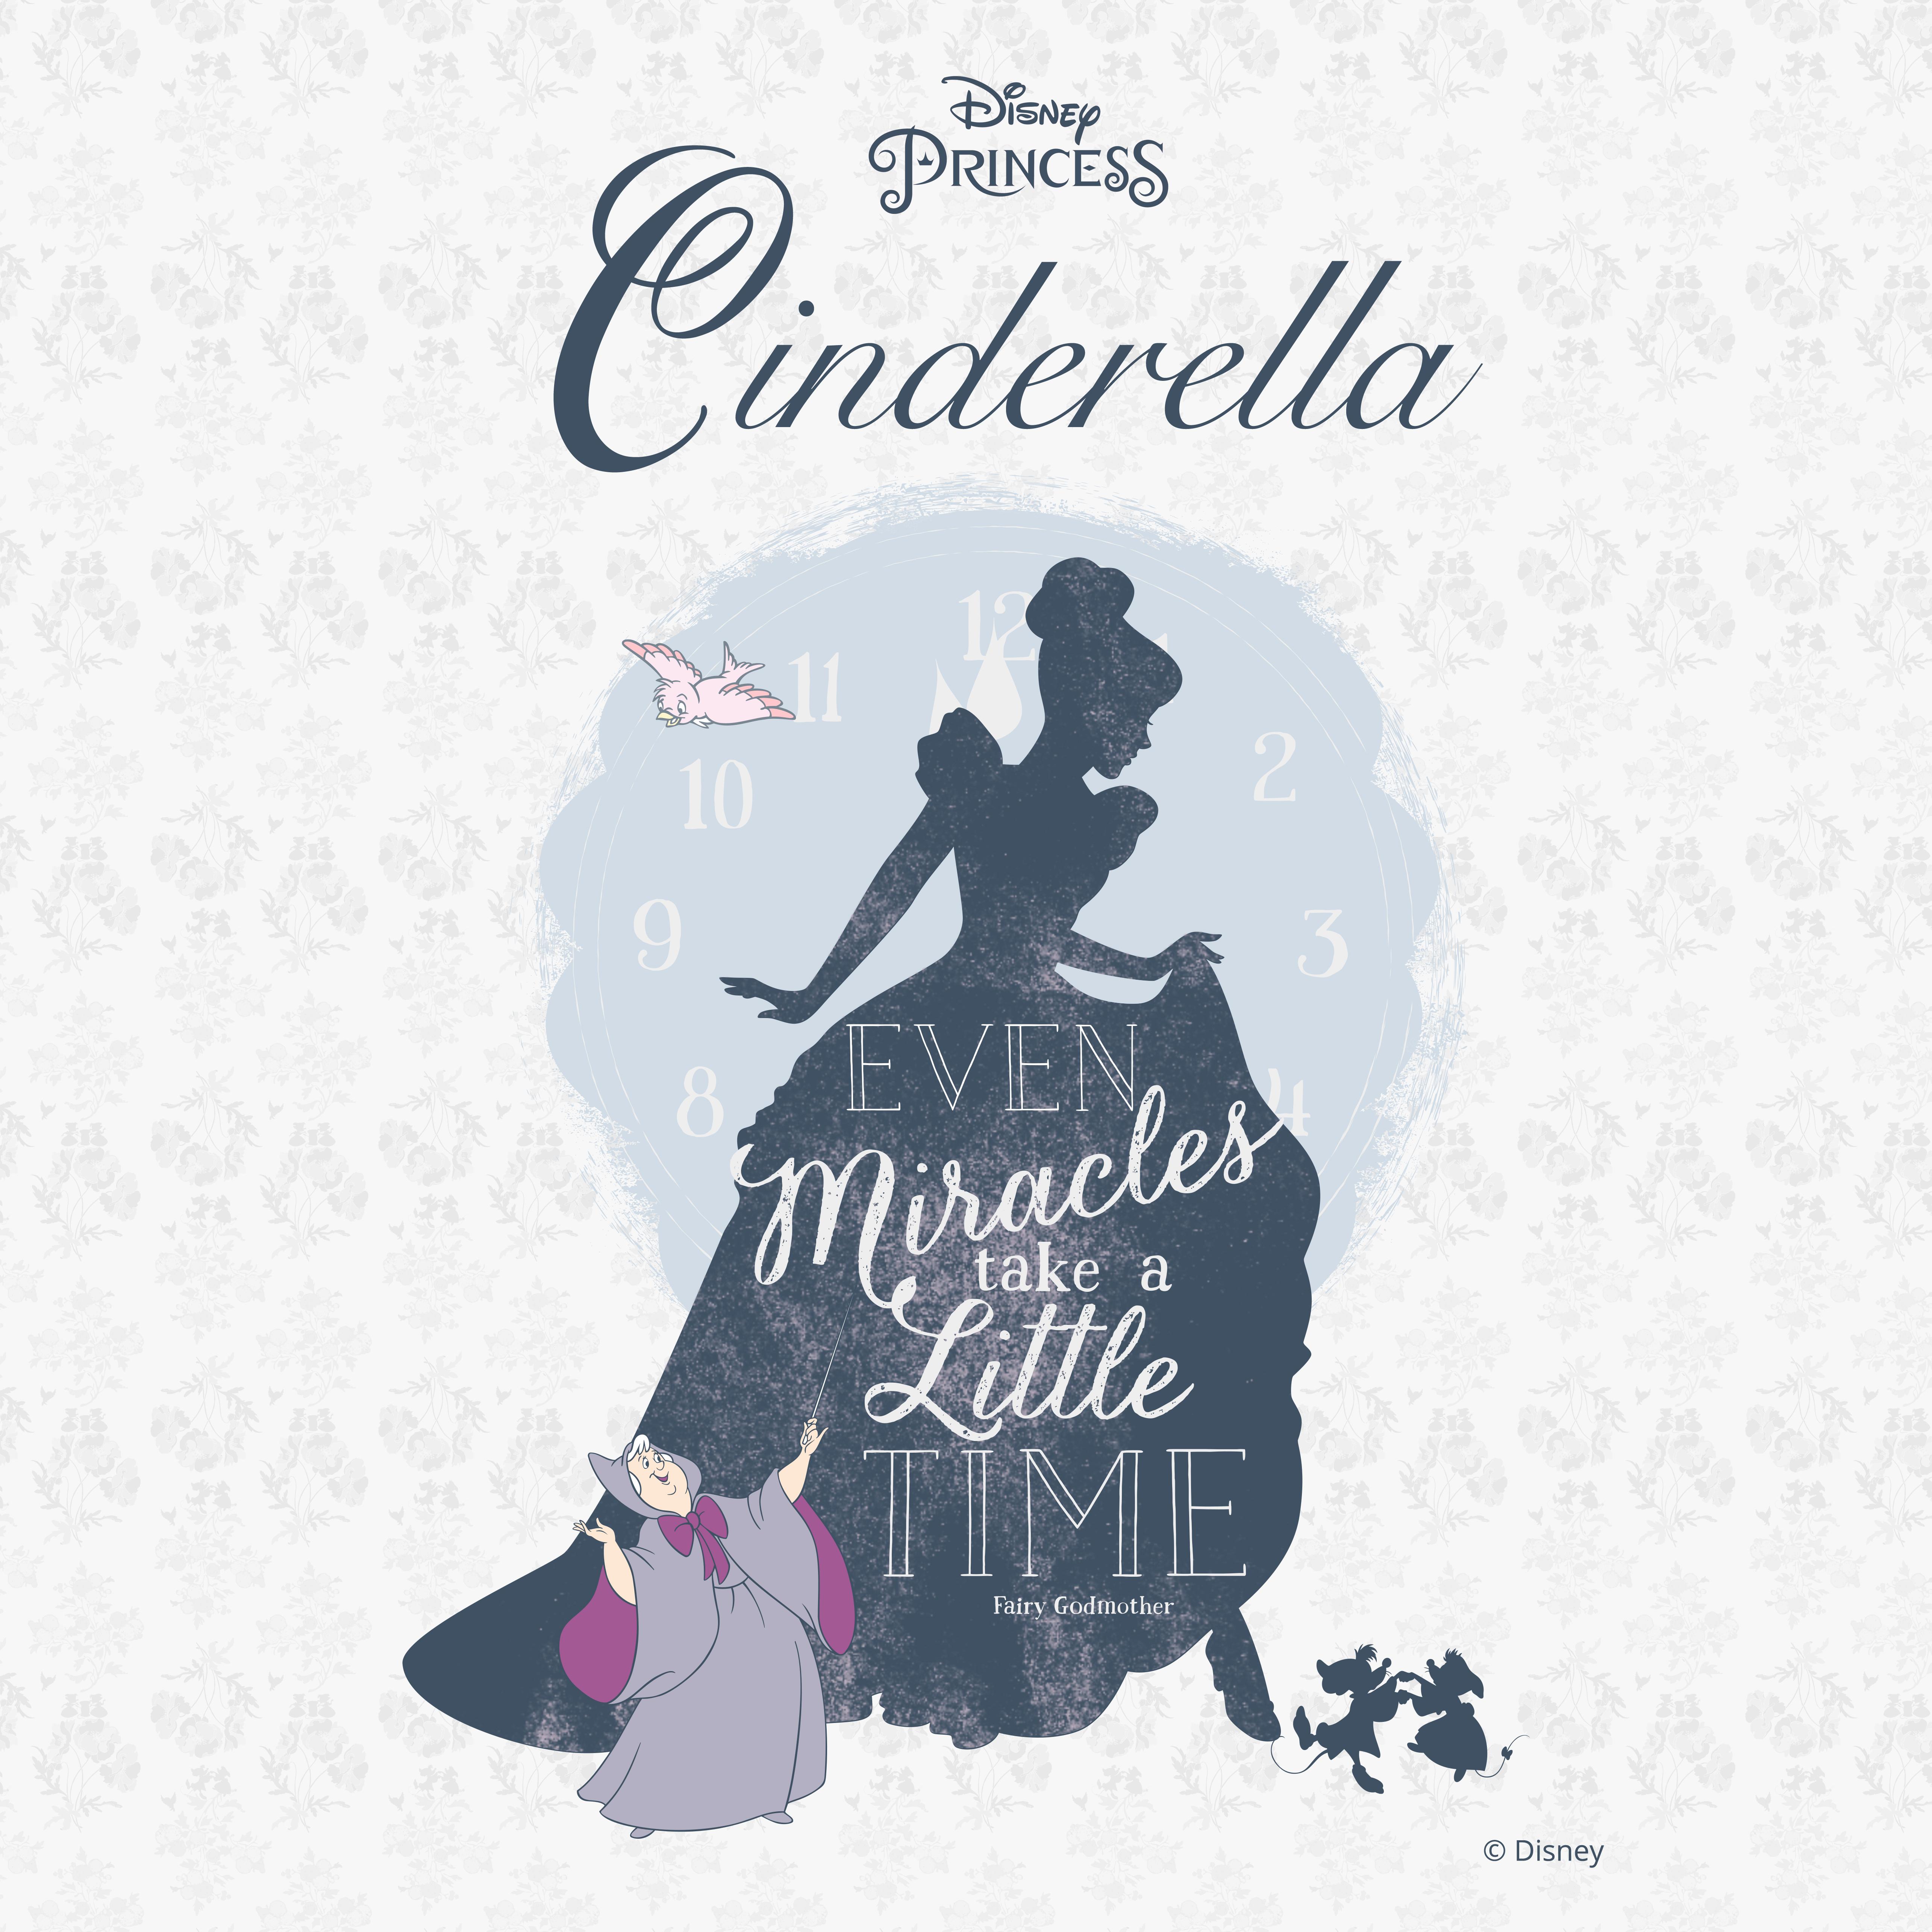 cinderella-square-princess-logo.jpg